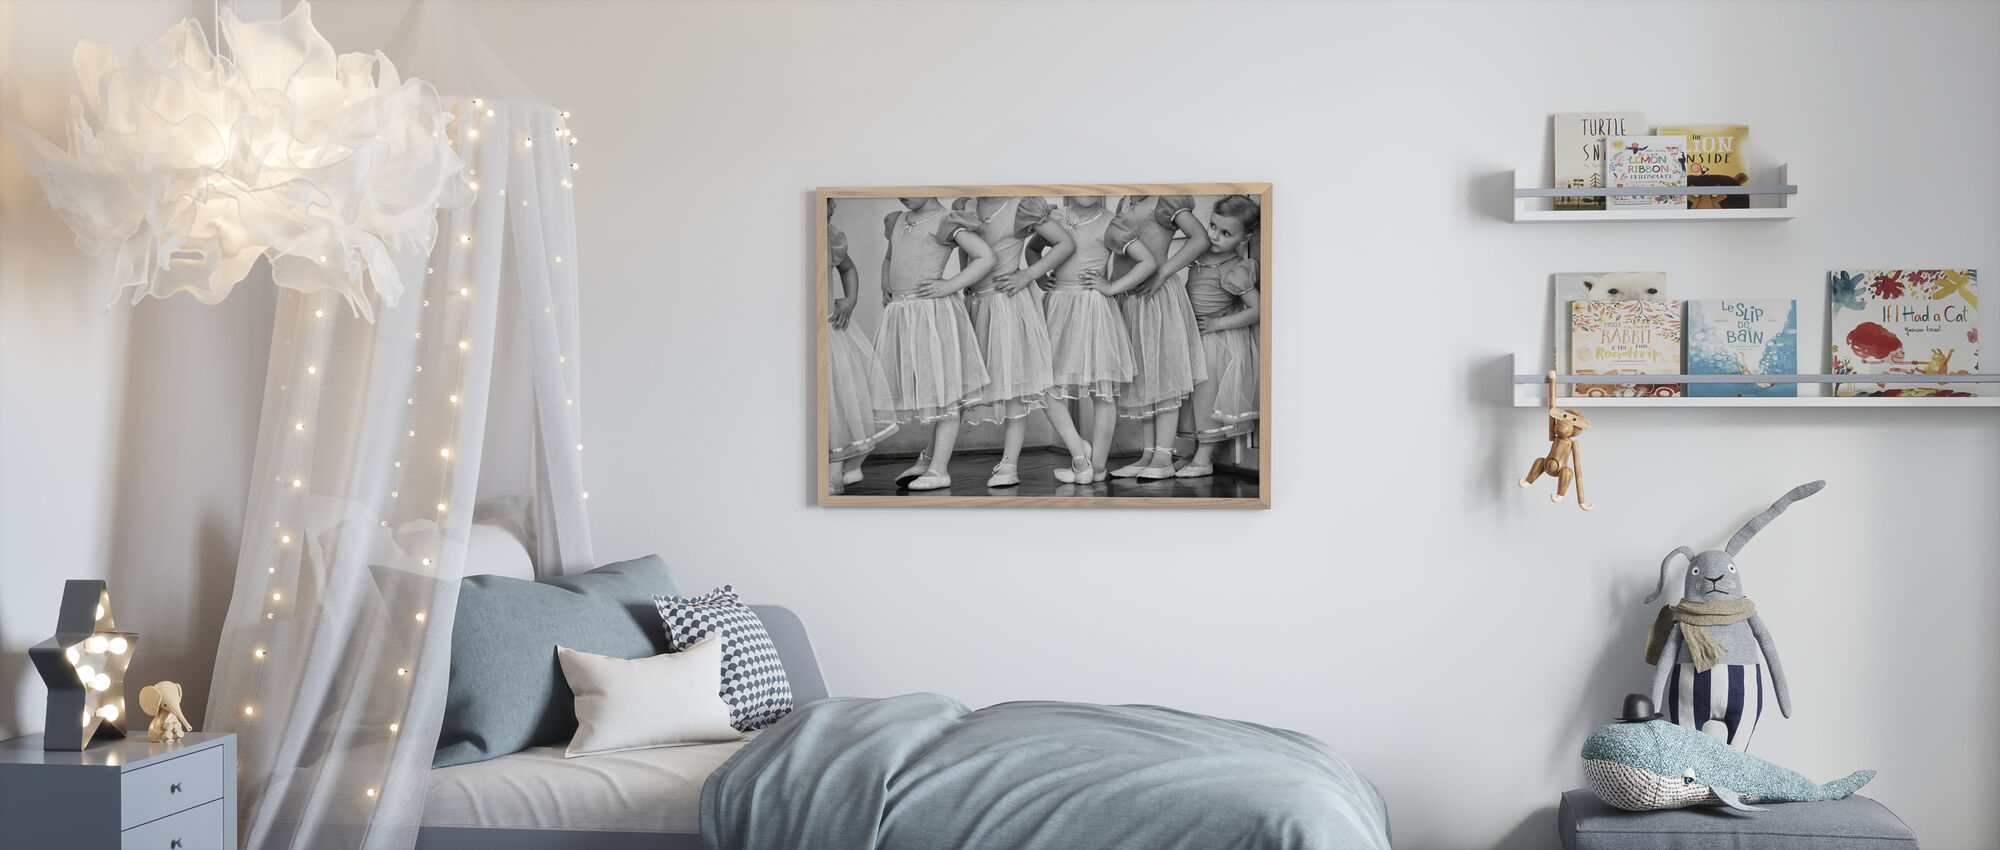 Ballerina - Poster - Kids Room